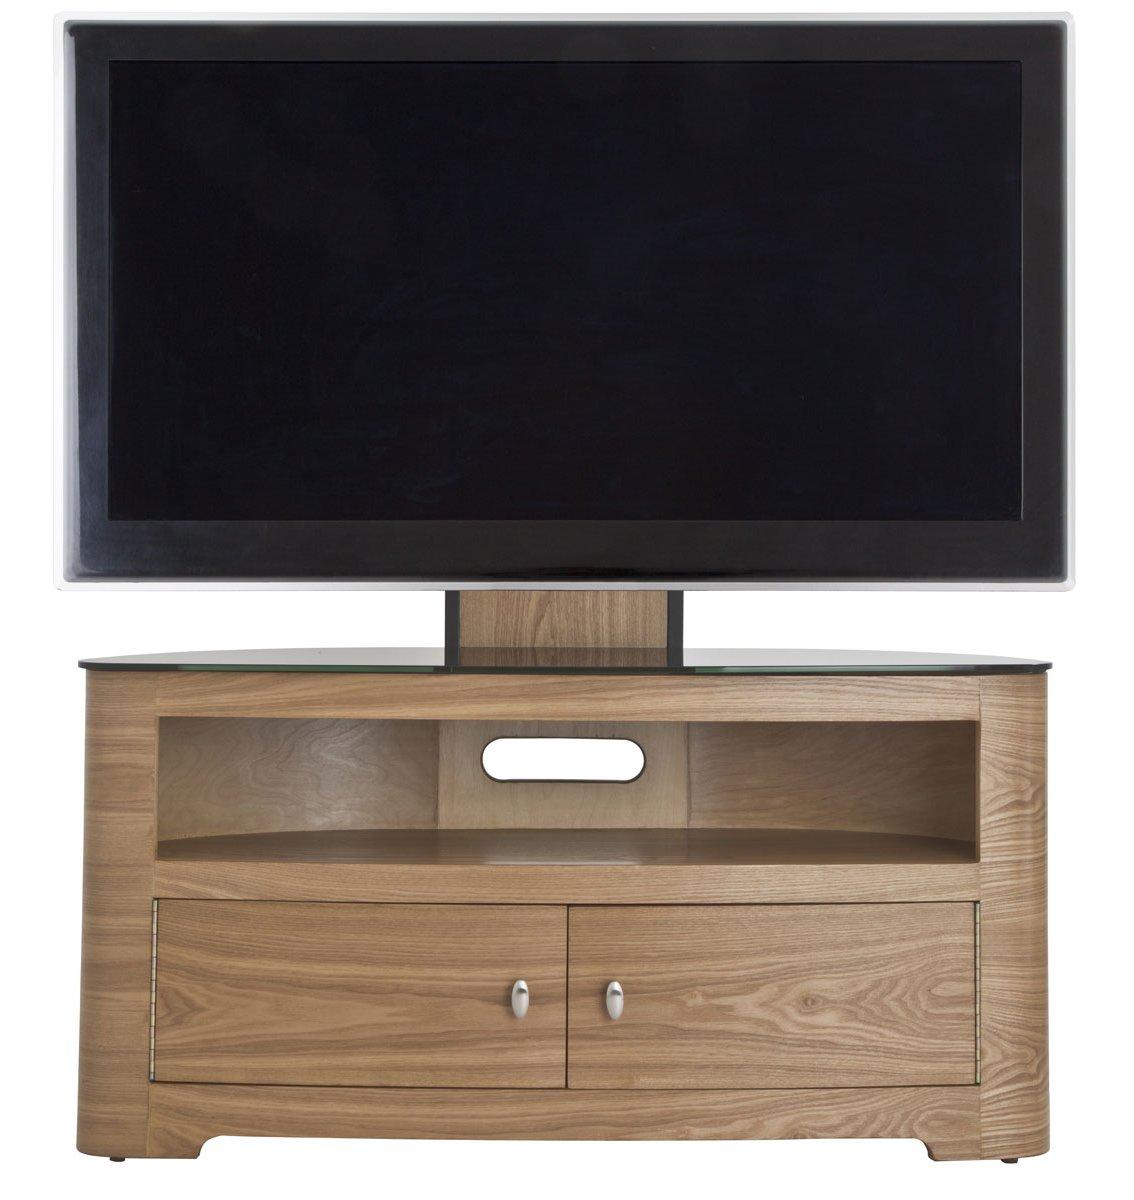 Avf Fsl1000bleo Blenheim Oak Tv Stand With Mount For Up To 65 Main Image